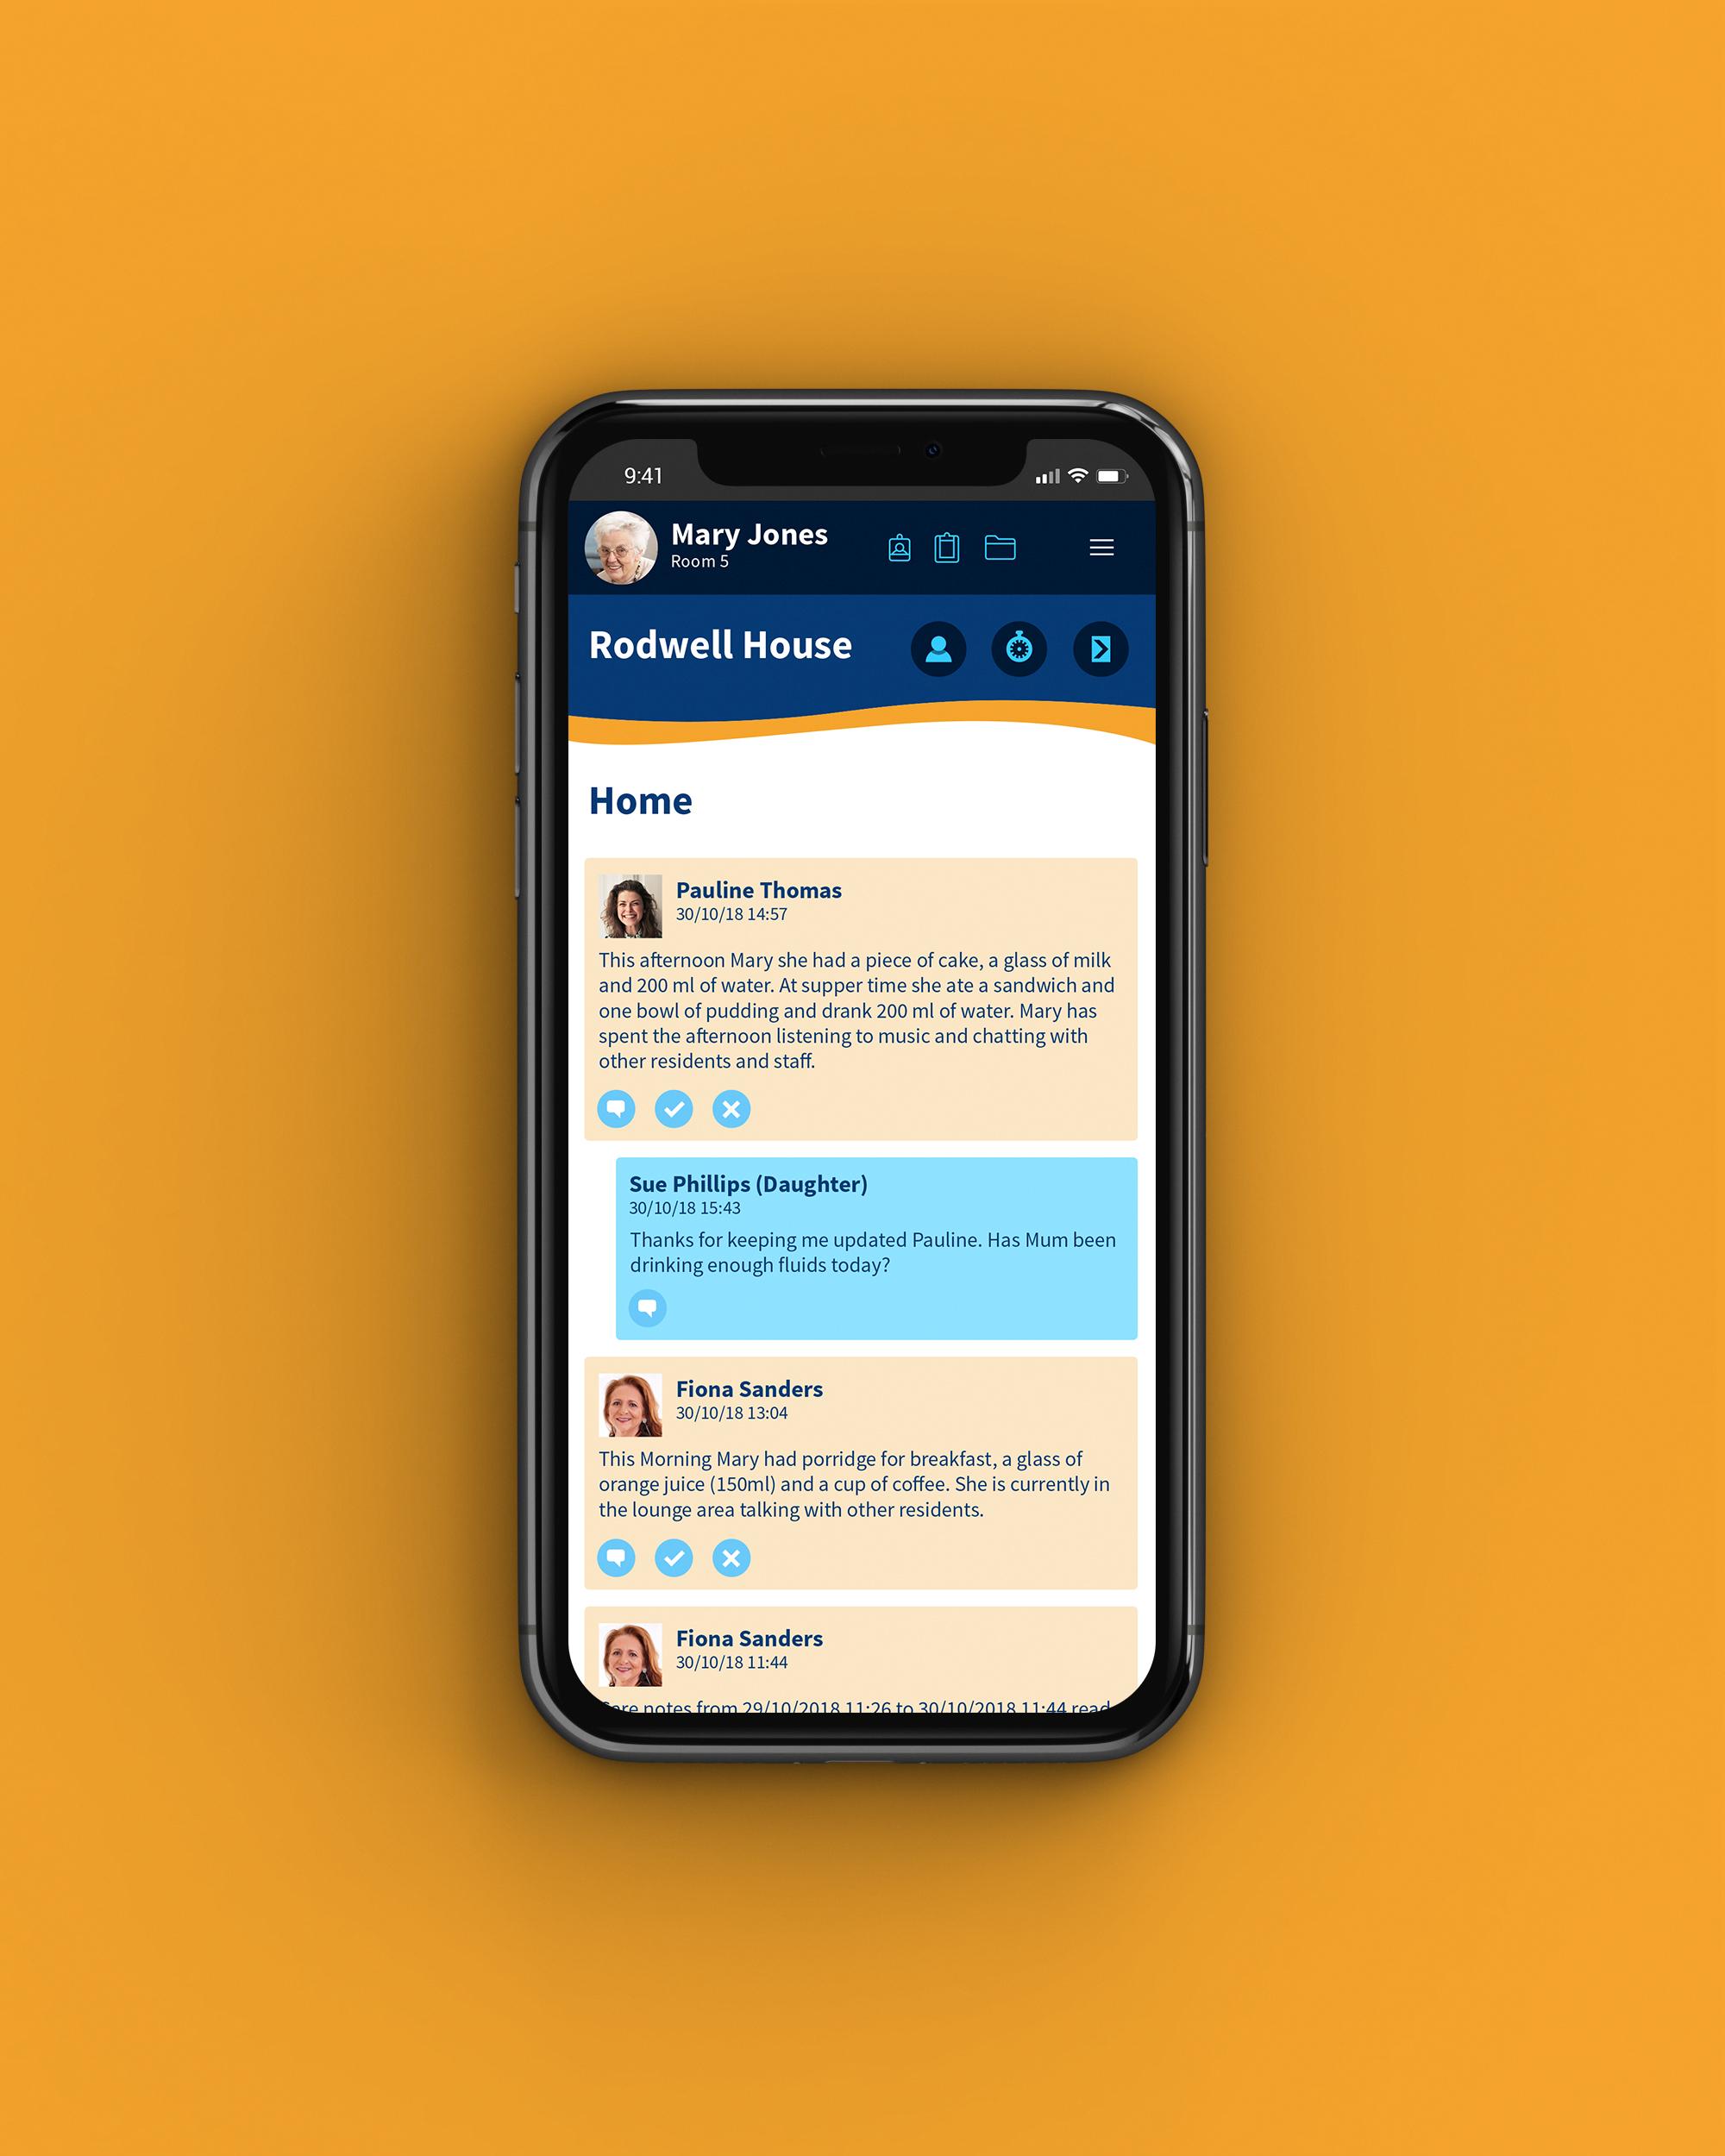 Care home management system mobile web app for Graham Care